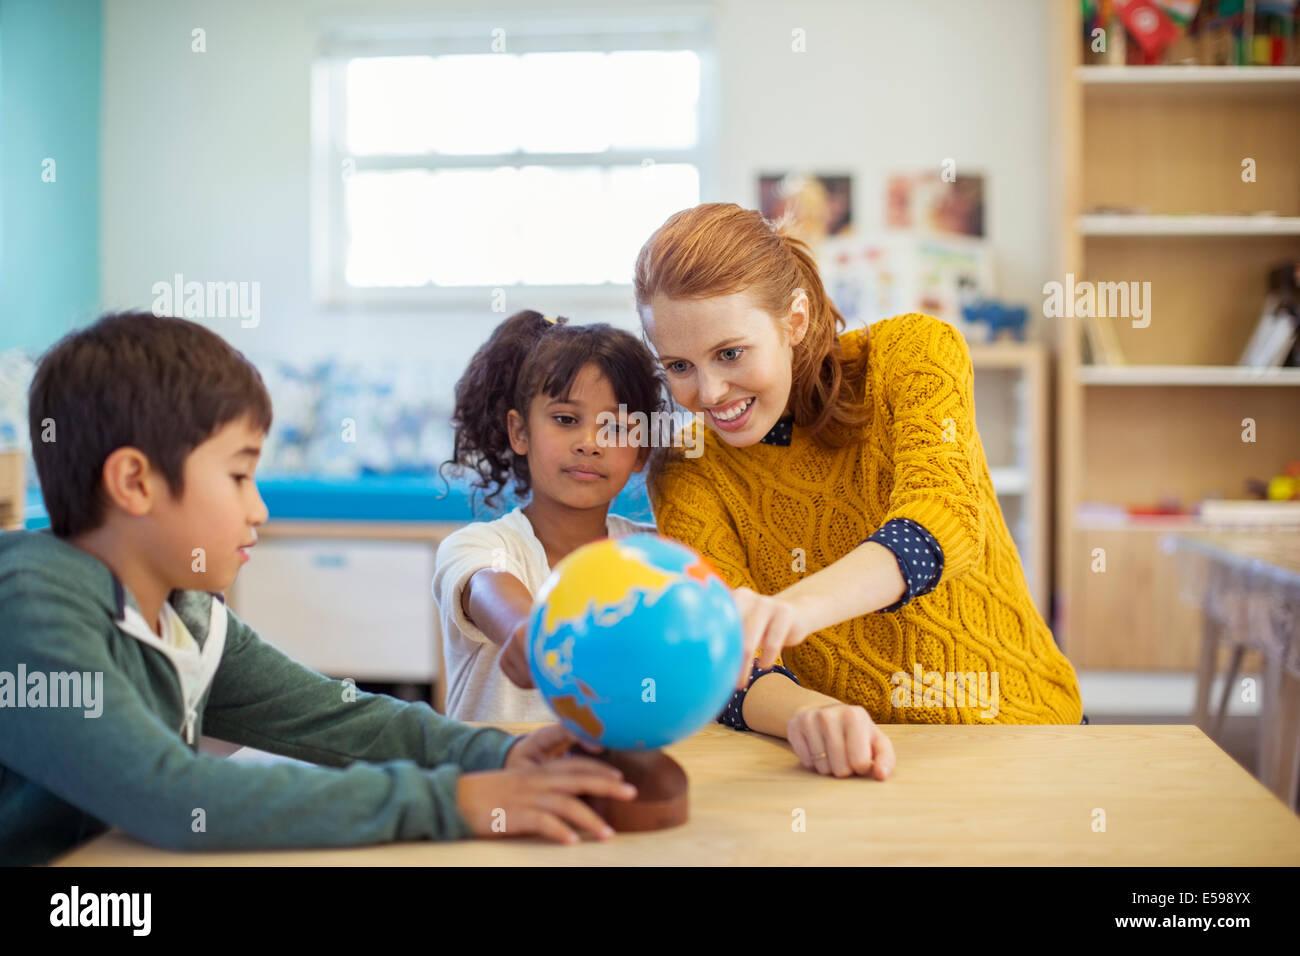 Schüler und Lehrer Prüfung Globus im Klassenzimmer Stockbild